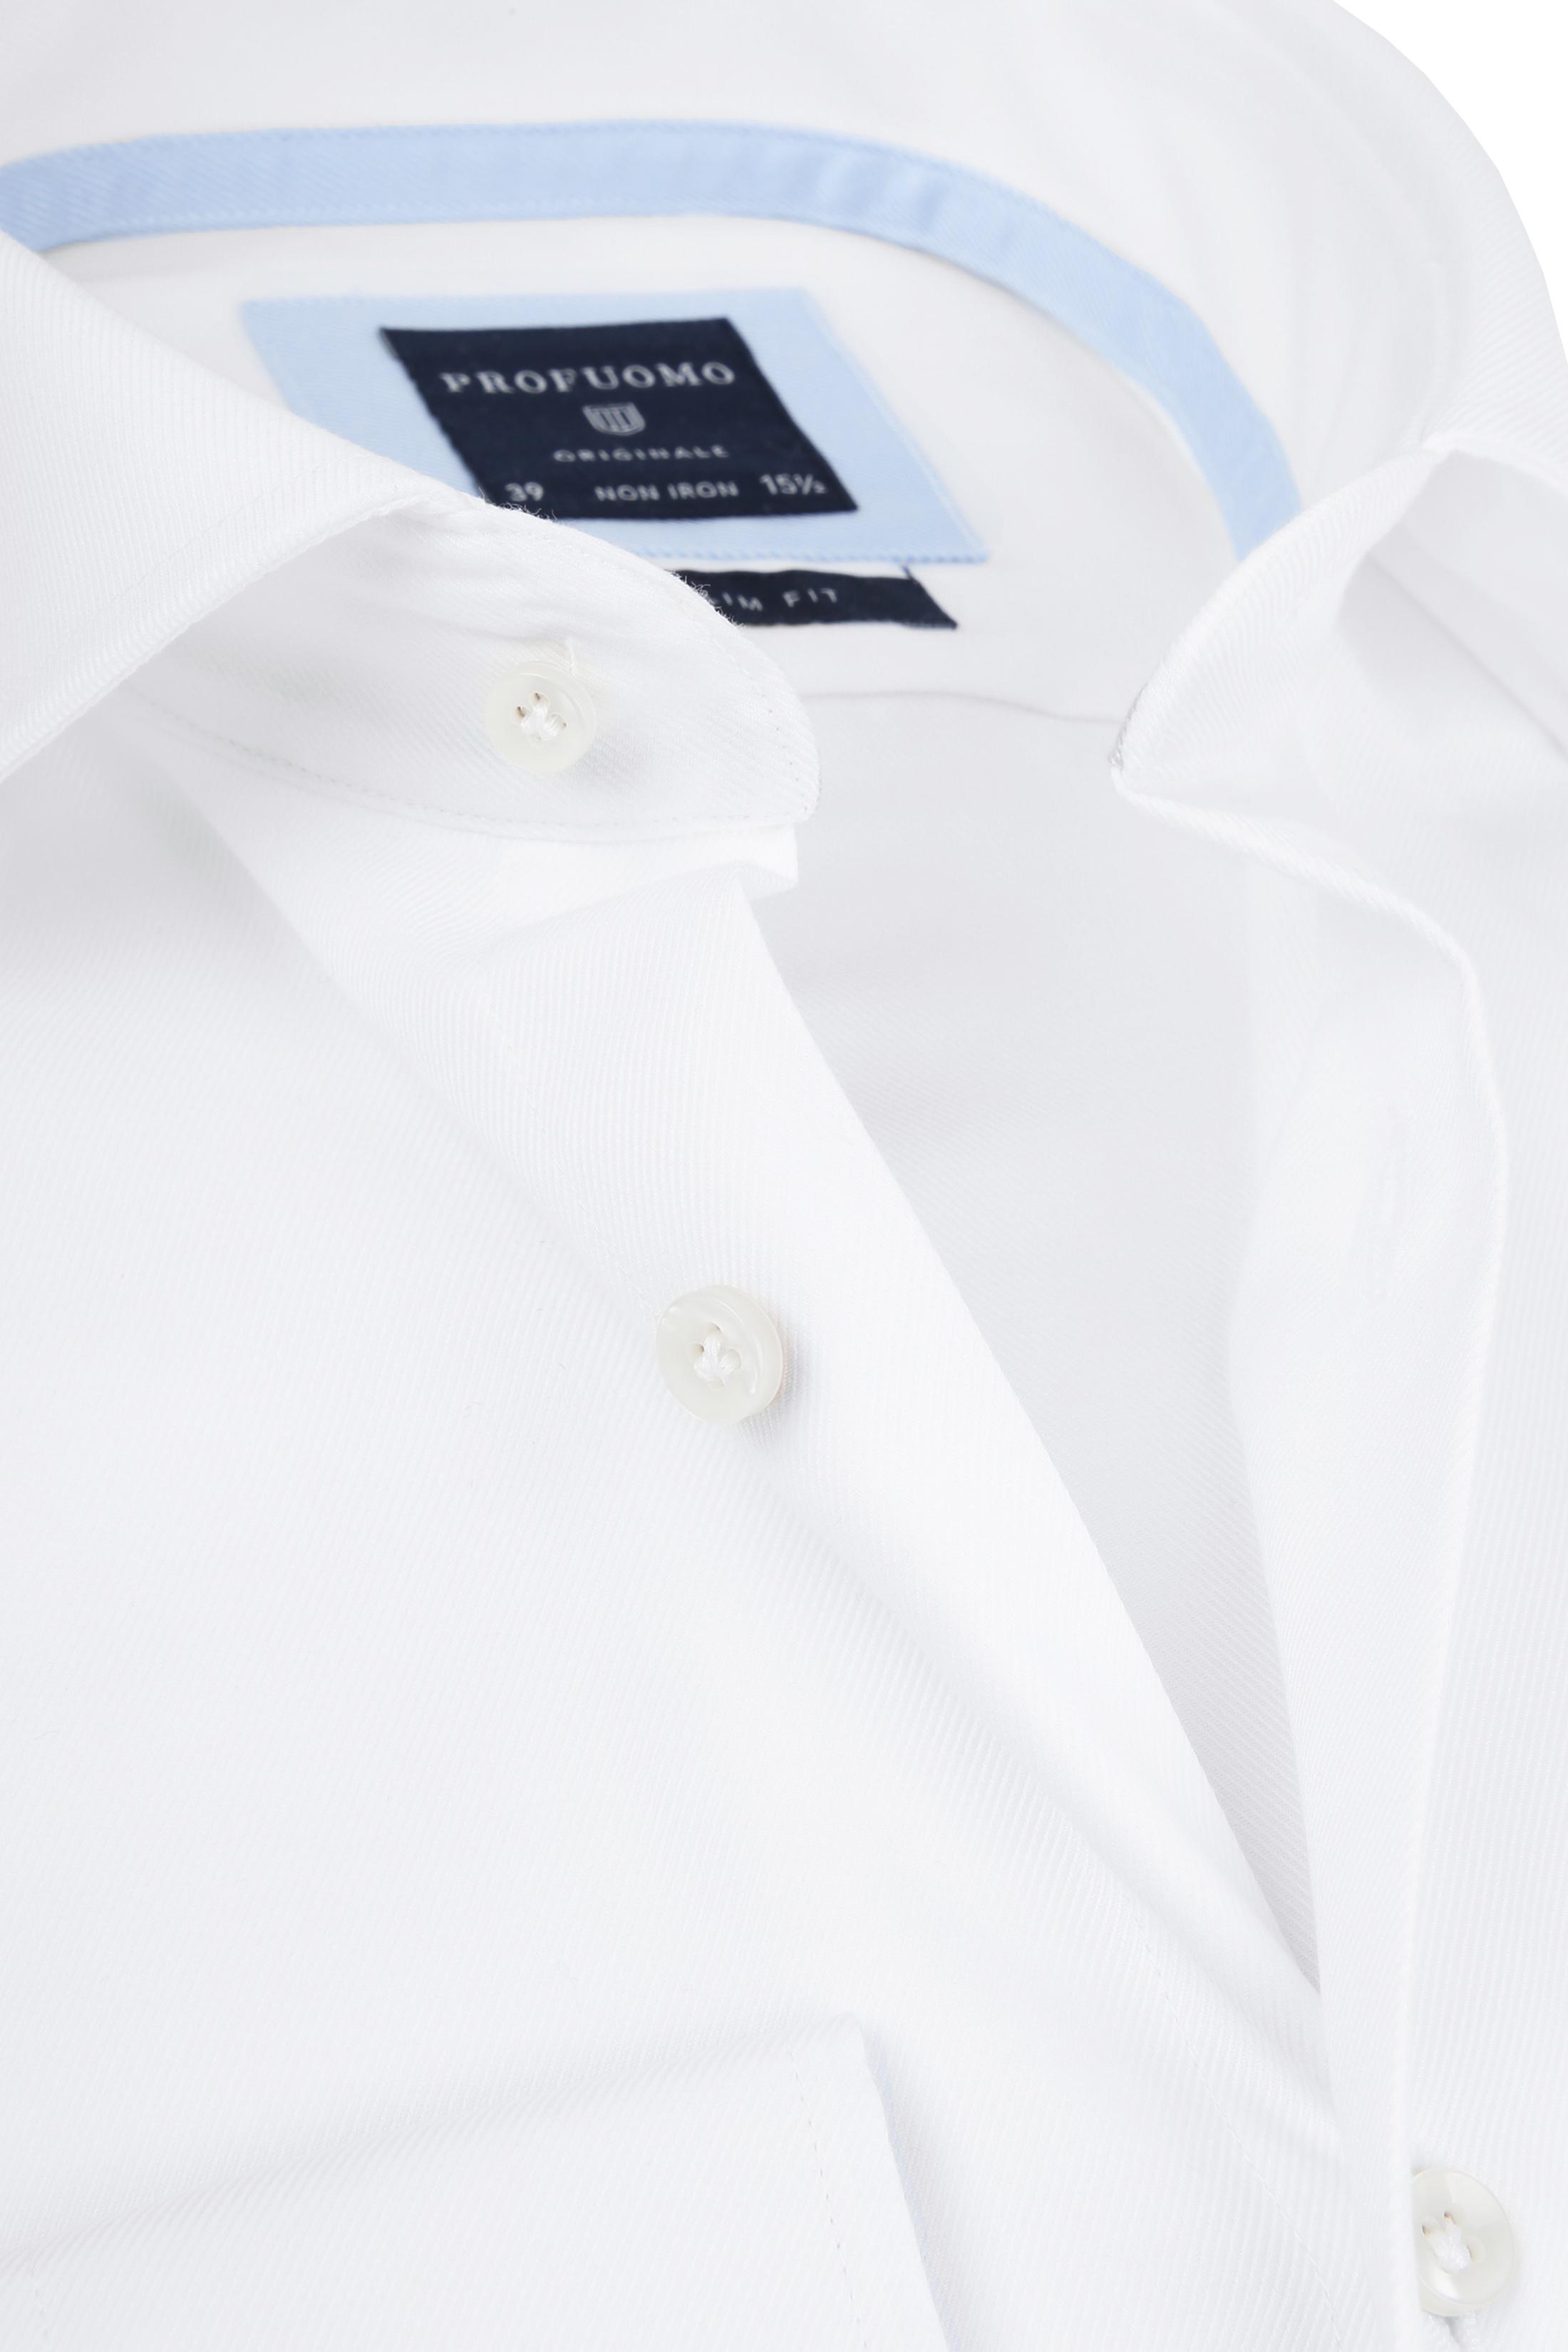 Profuomo Overhemd Wit Blauw Accent foto 1